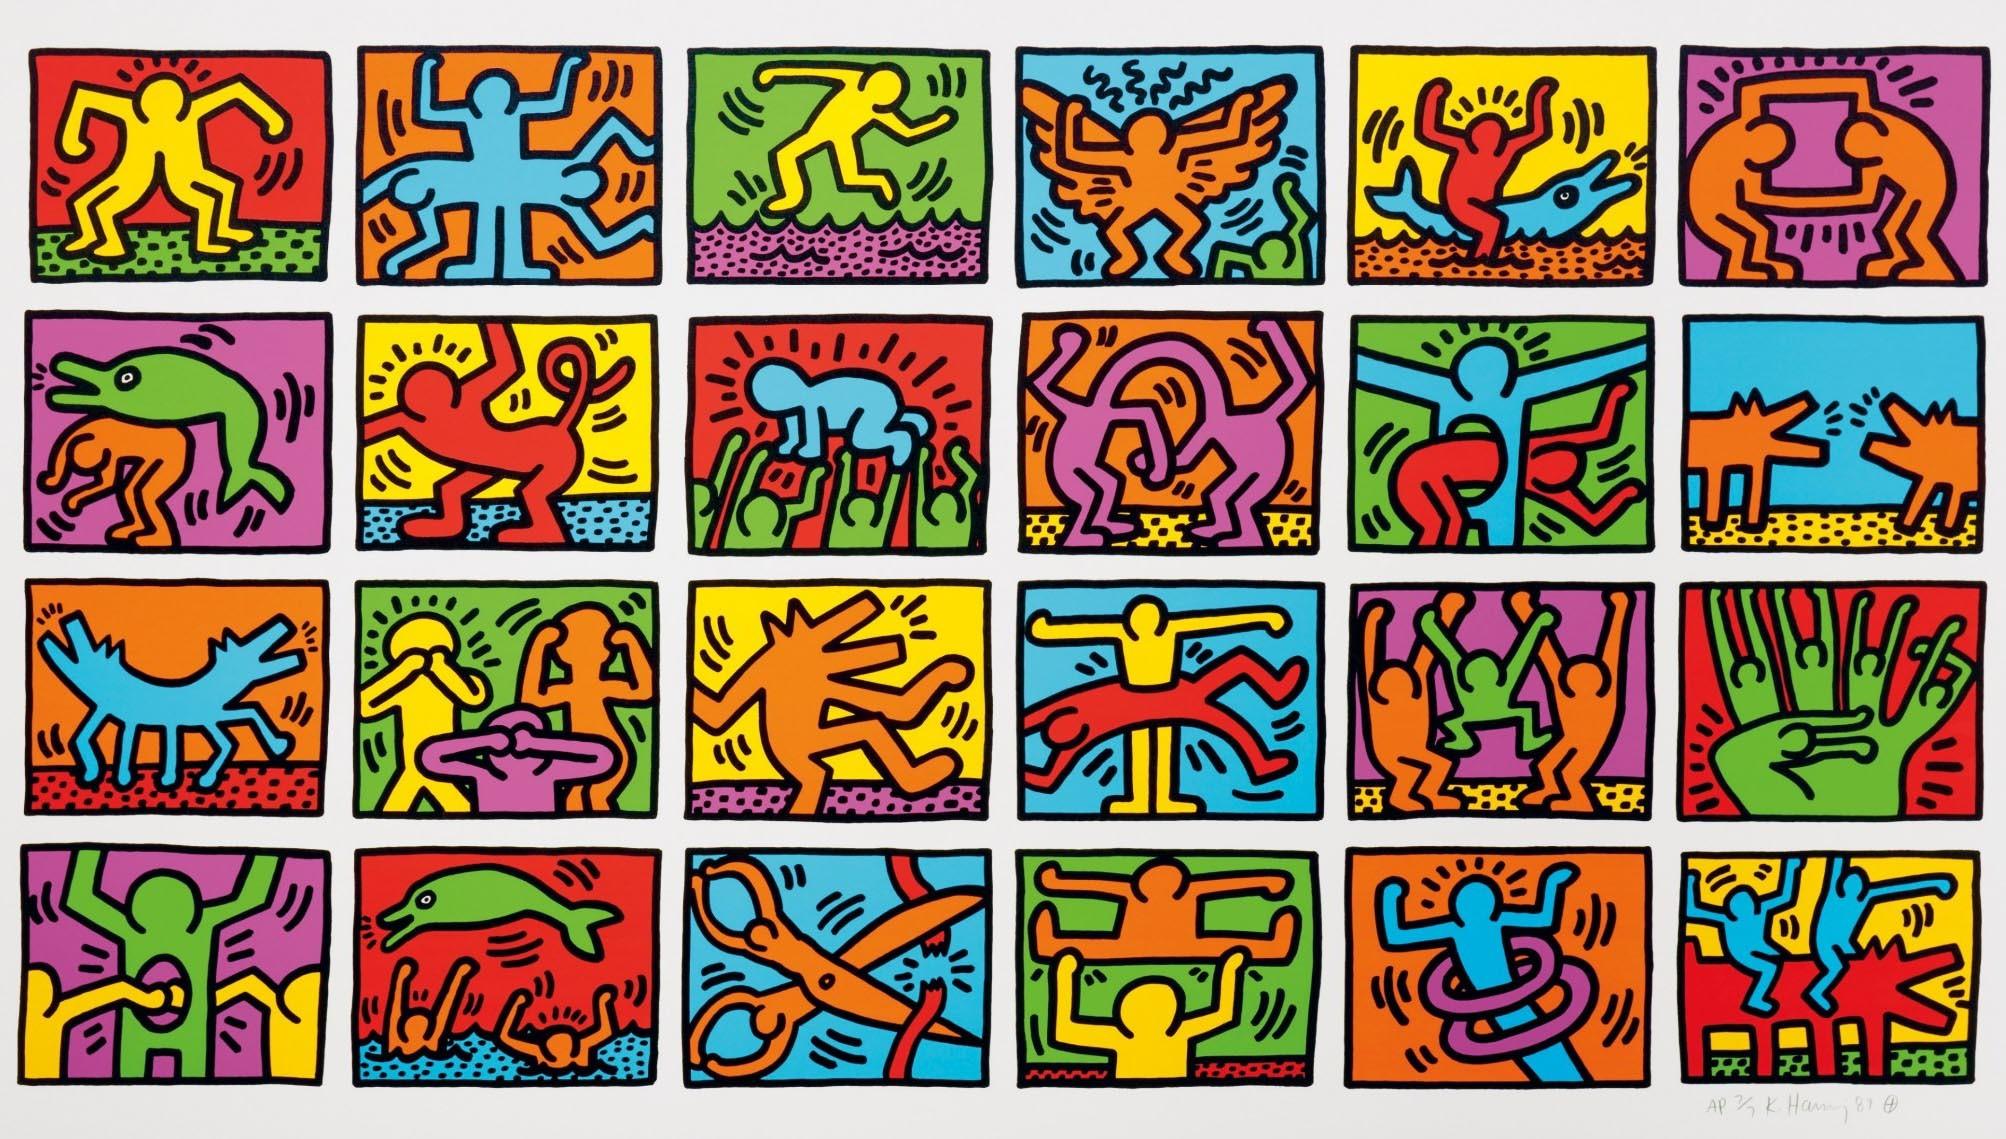 Keith Haring Wallpaper 50 Immagini